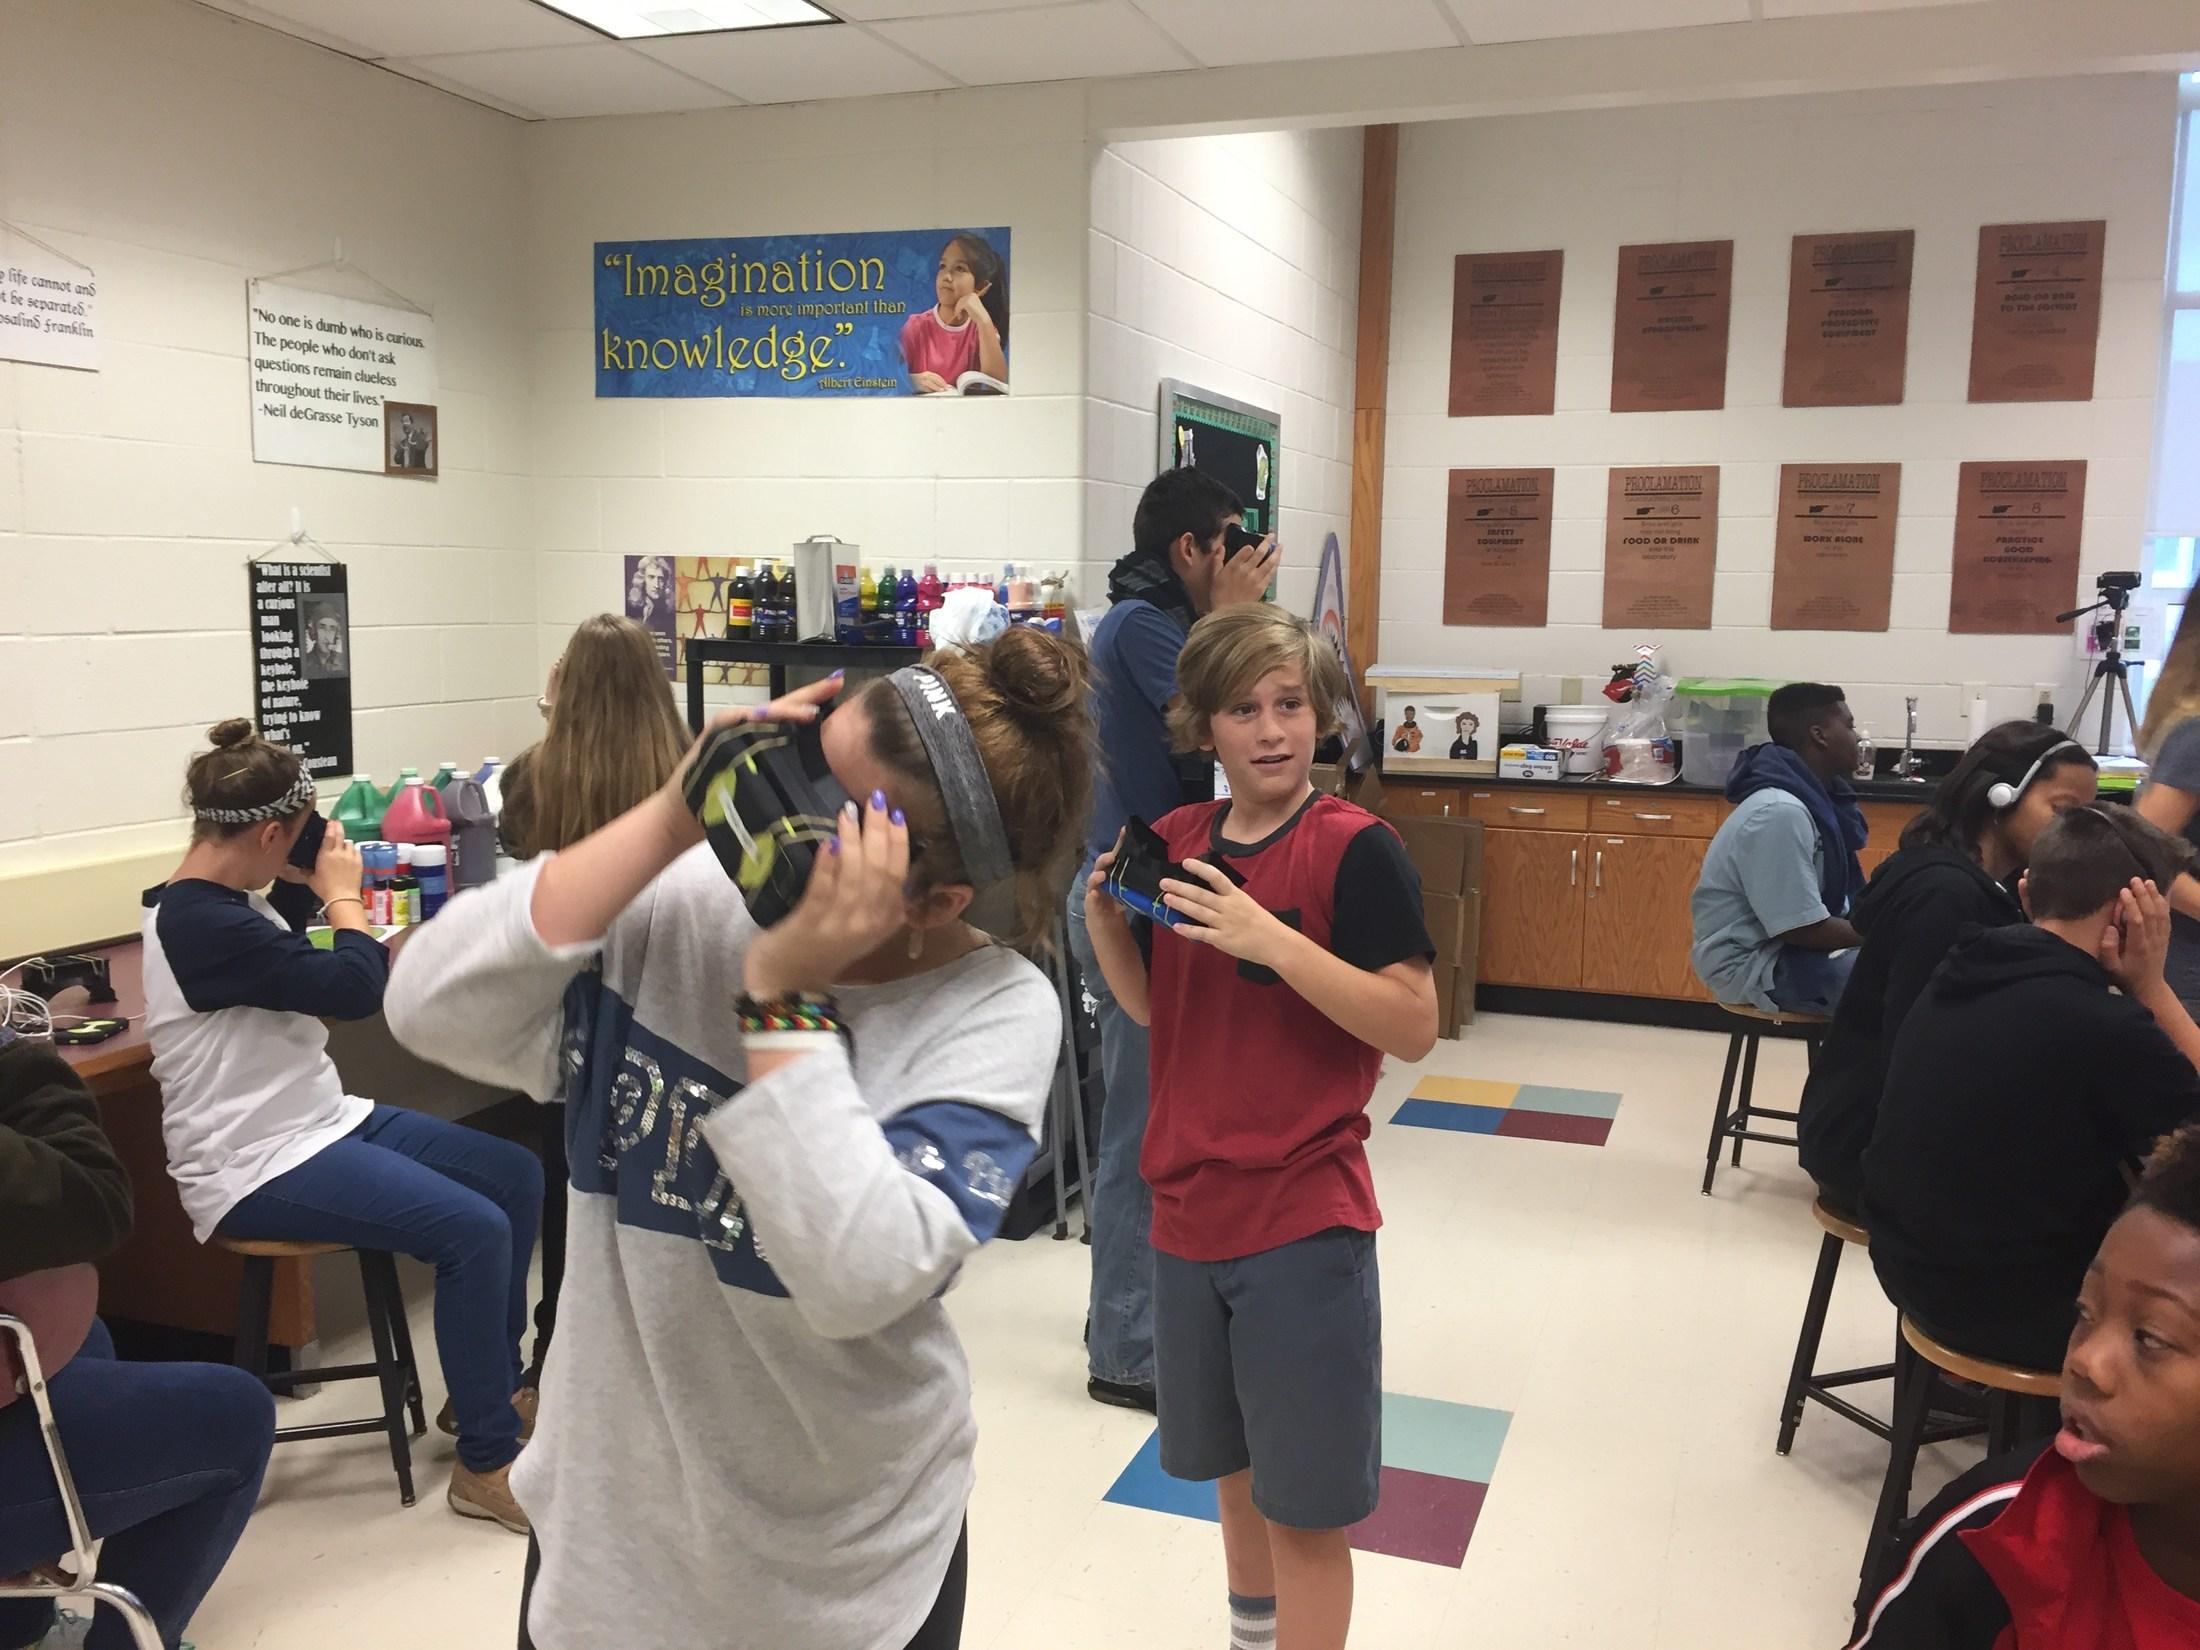 Virtual reality tours